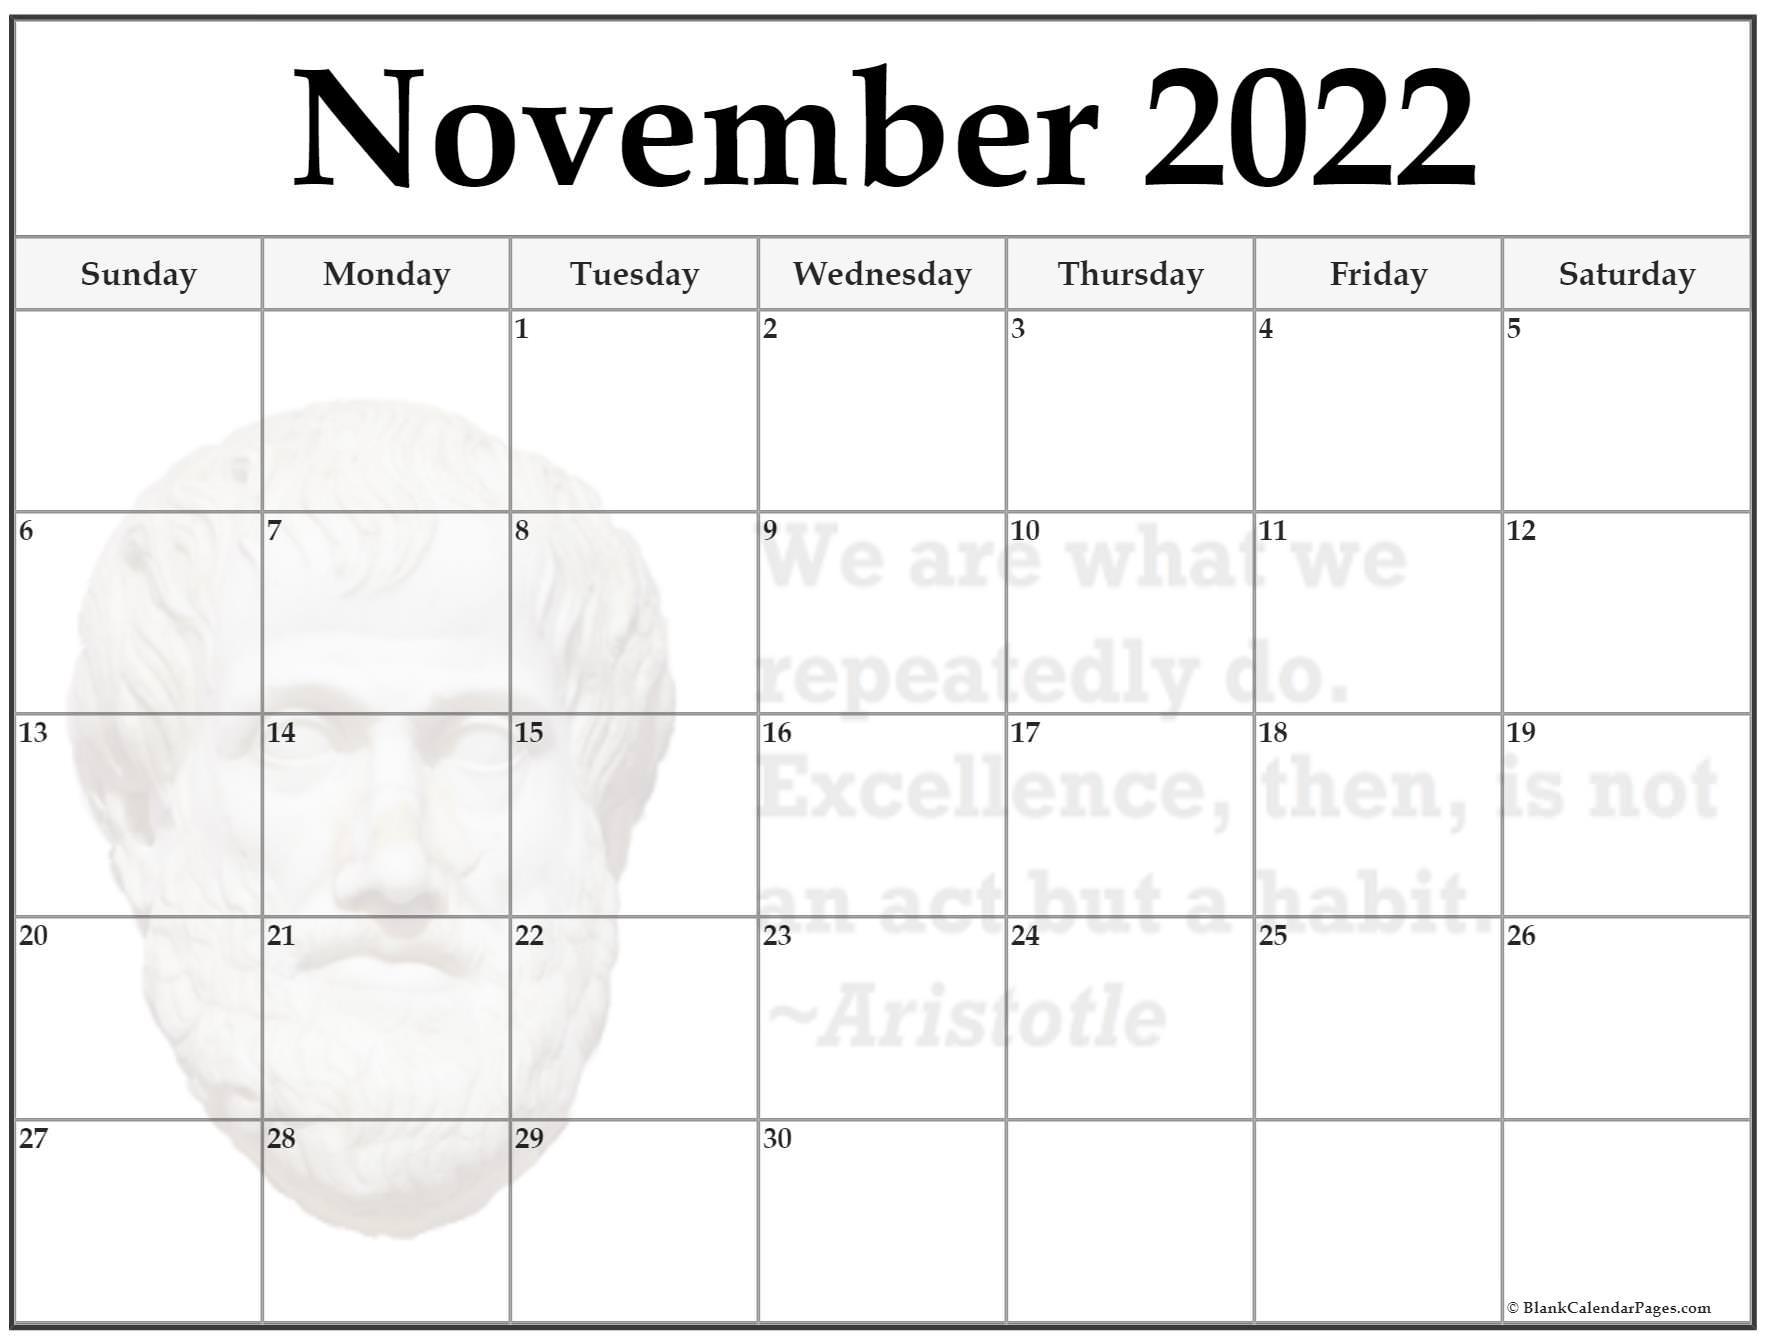 November 2022 Aristotle quote calendar